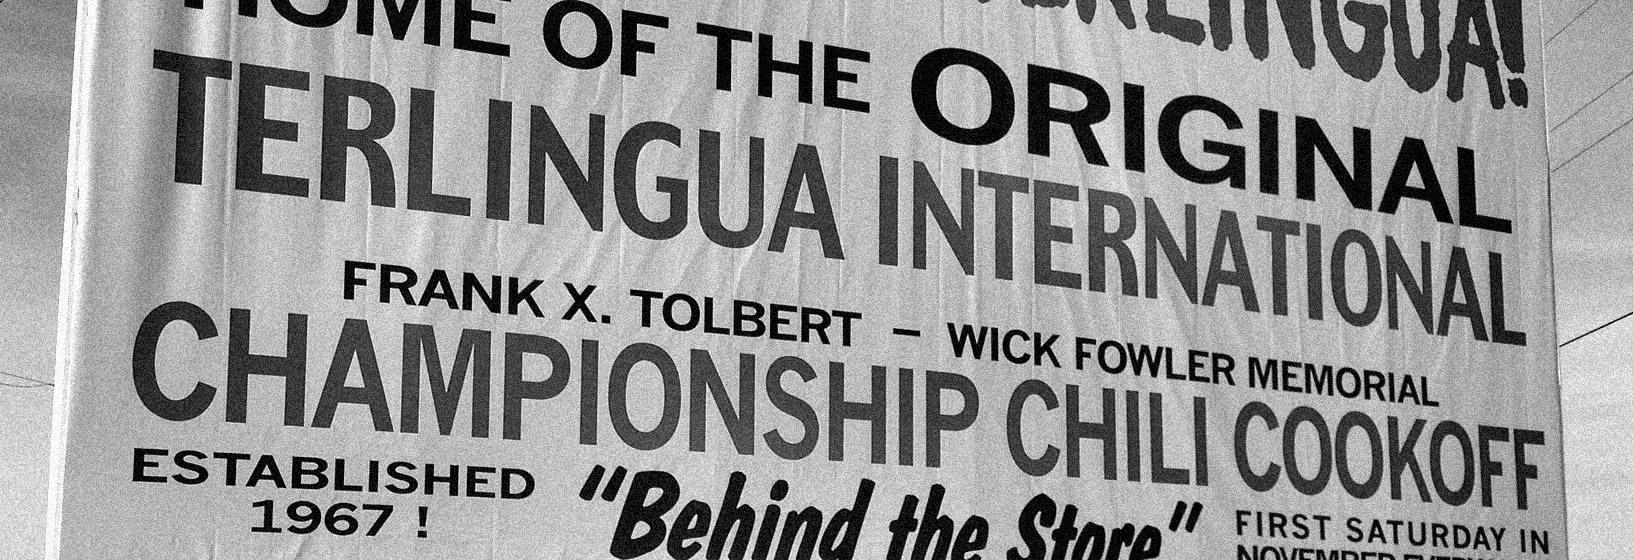 Terlingua International Chili Championship